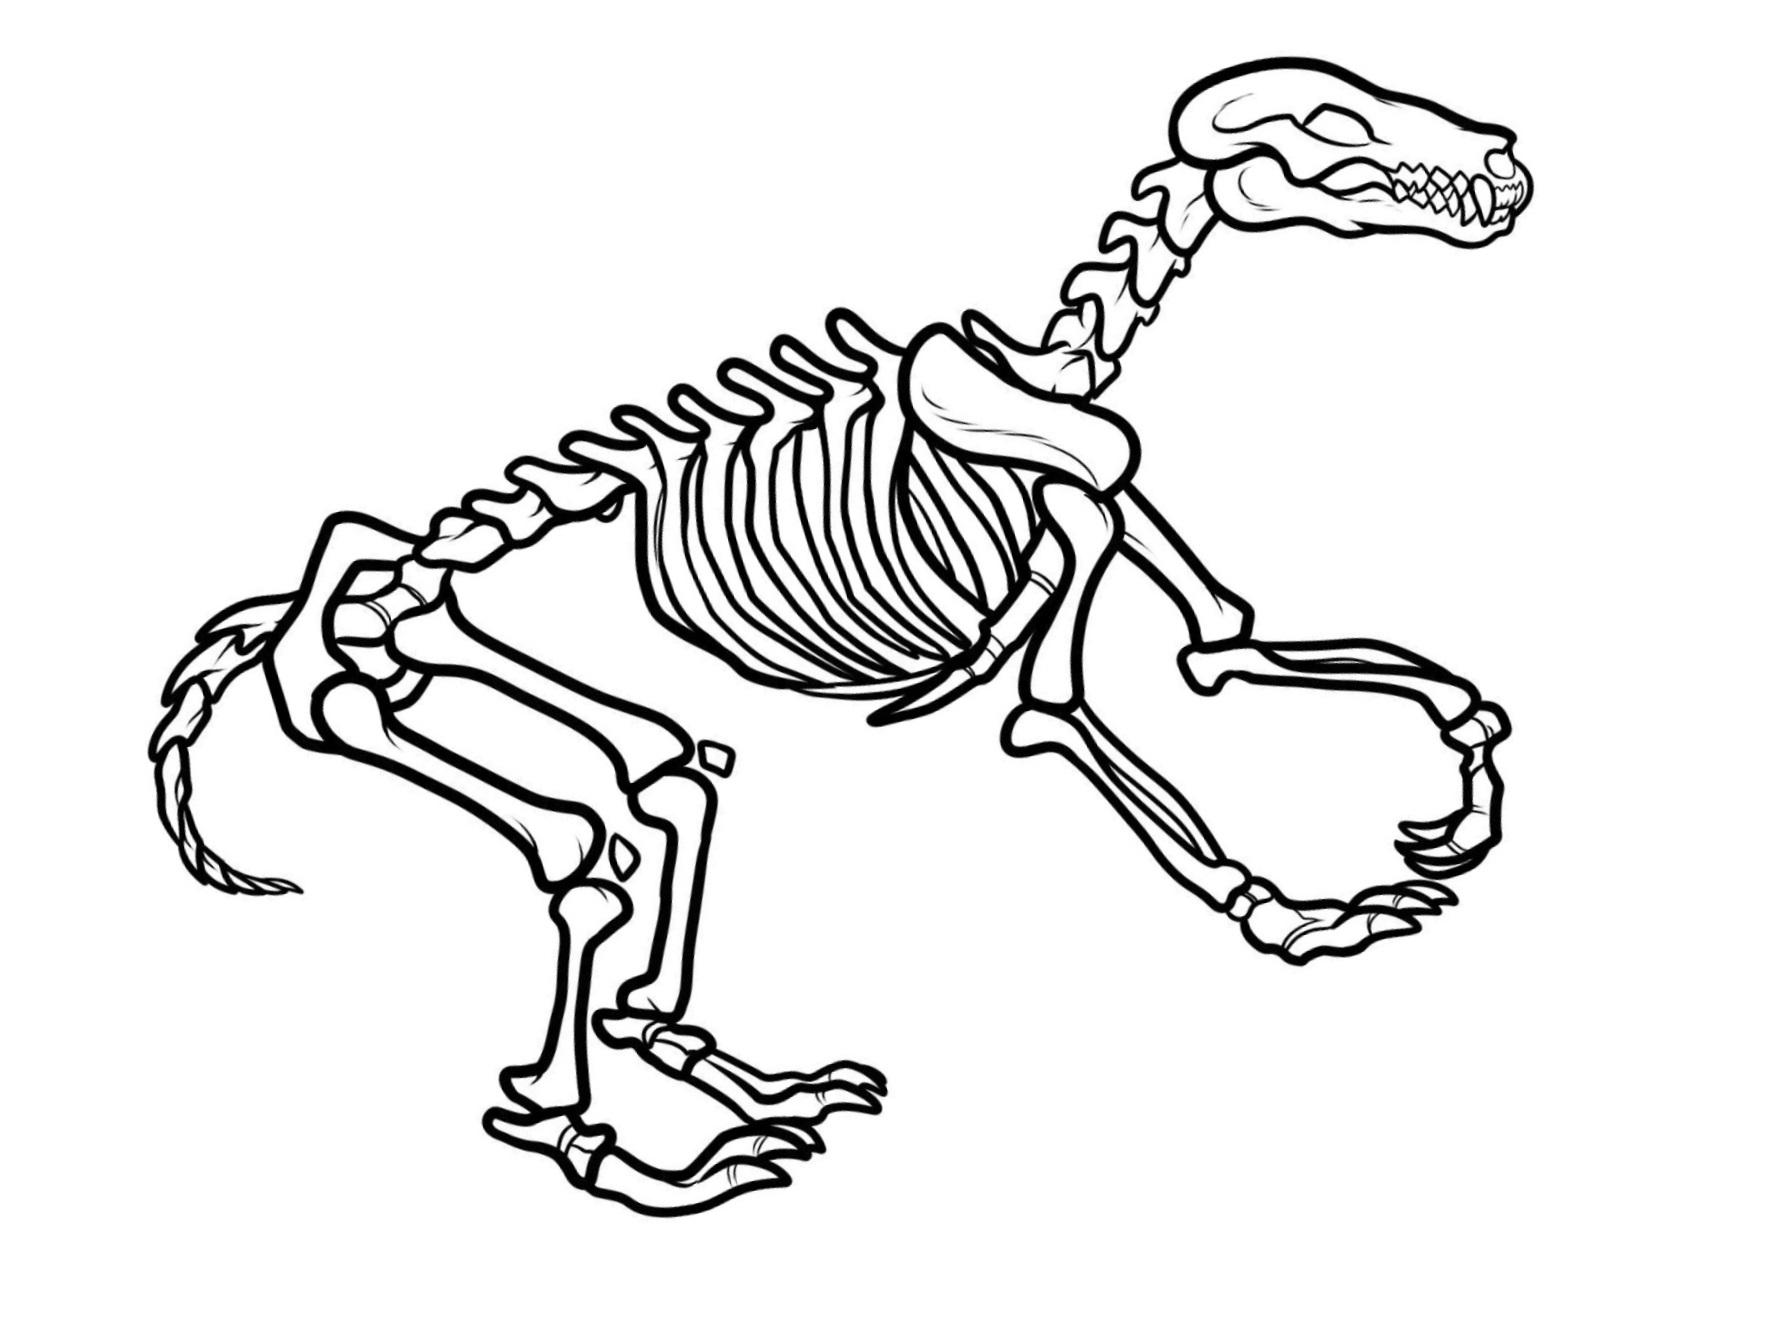 1792x1323 Drawn Bones Dino